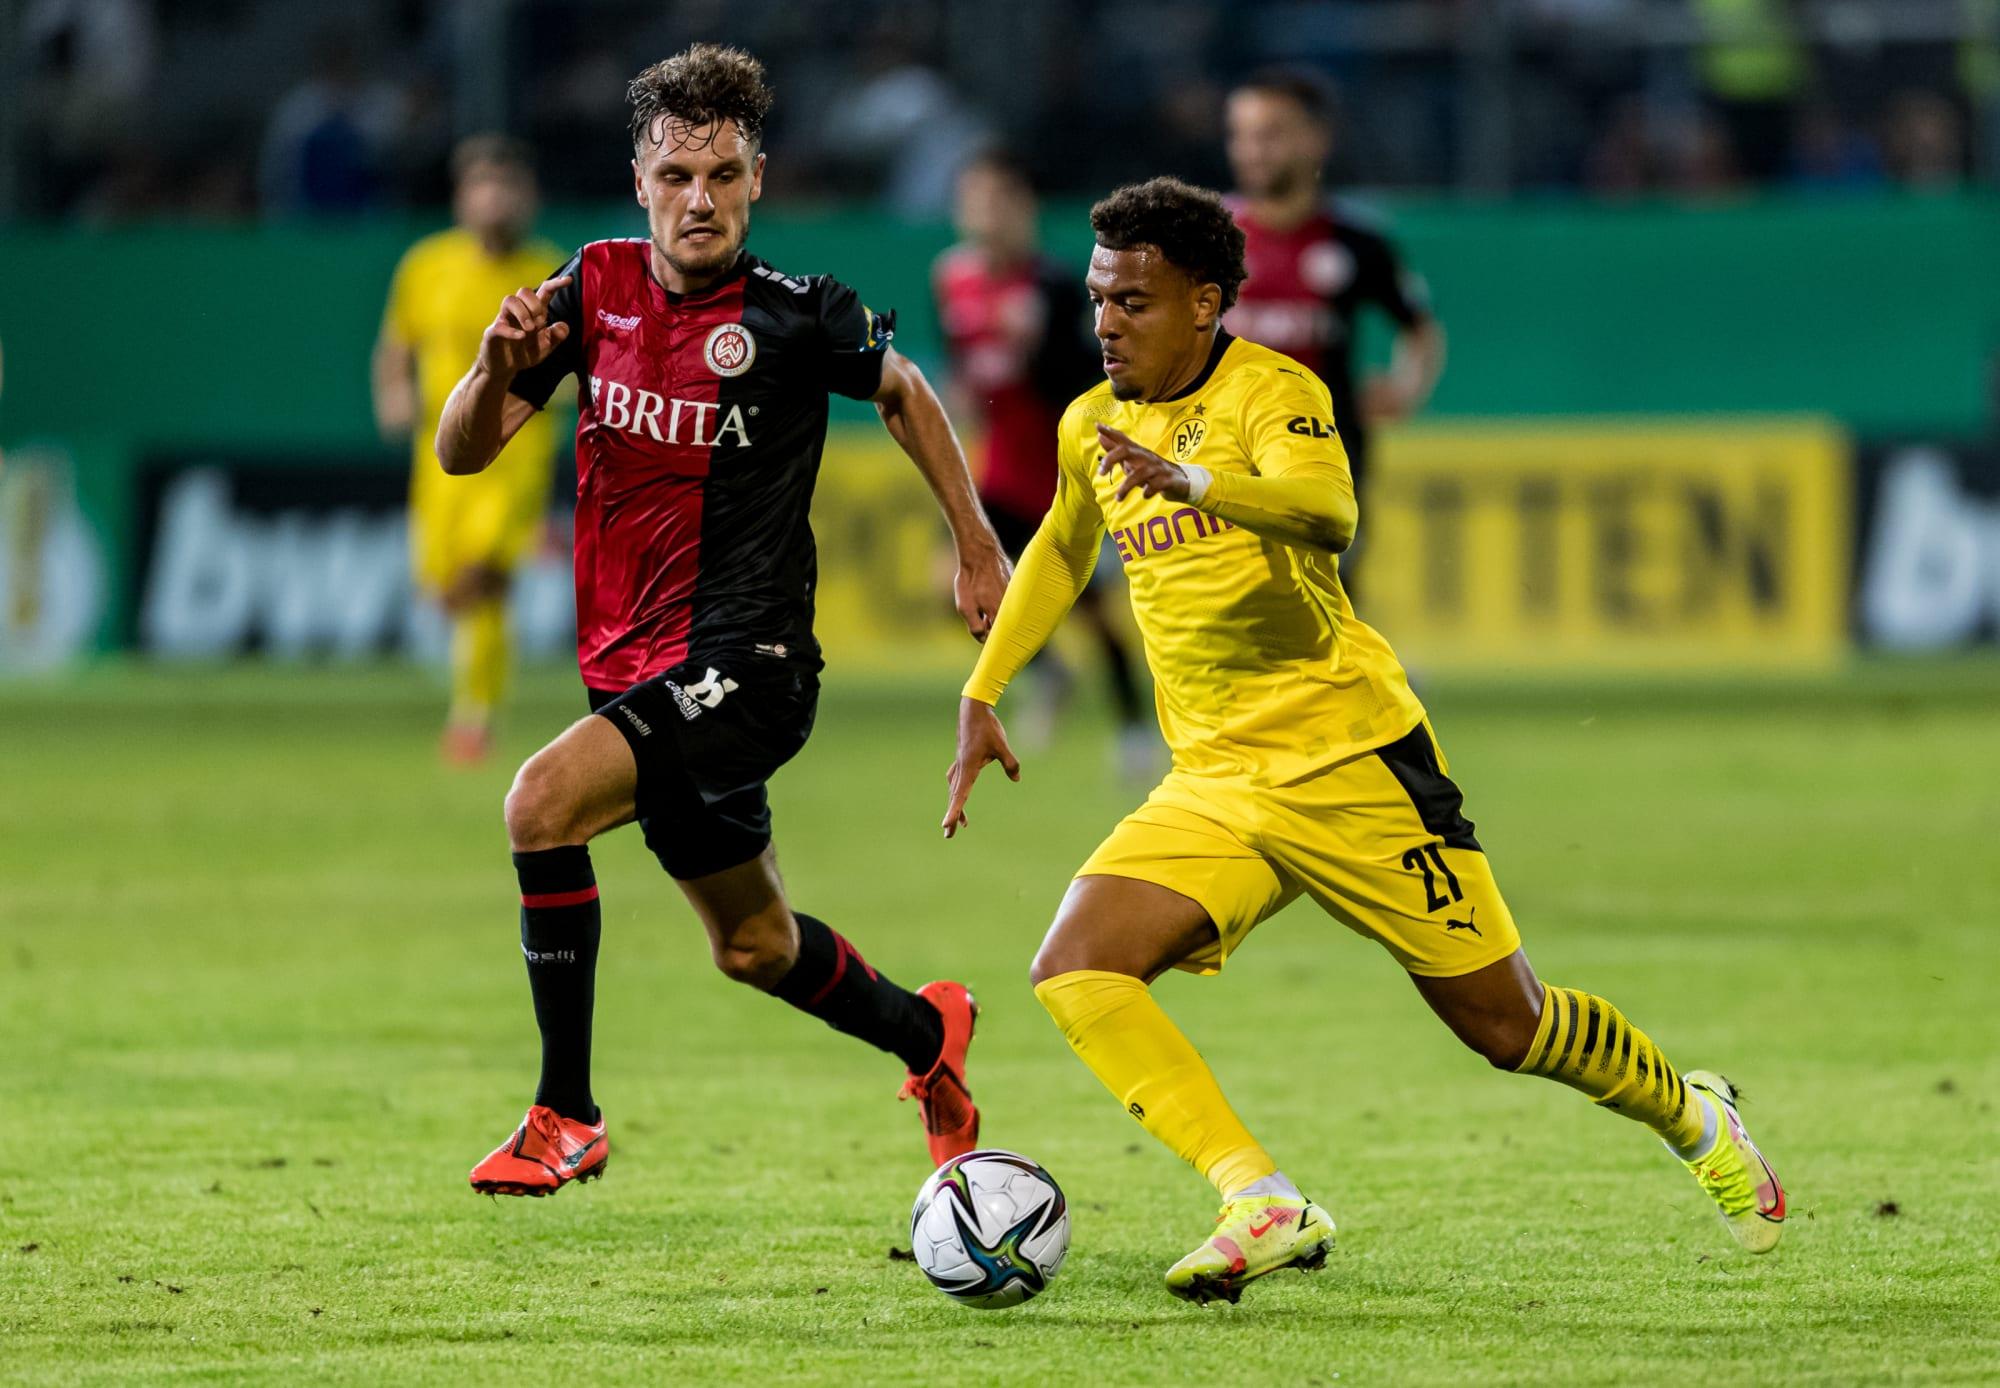 Watch Borussia Dortmund vs Eintracht Frankfurt: Live Stream, TV info for Bundesliga clash